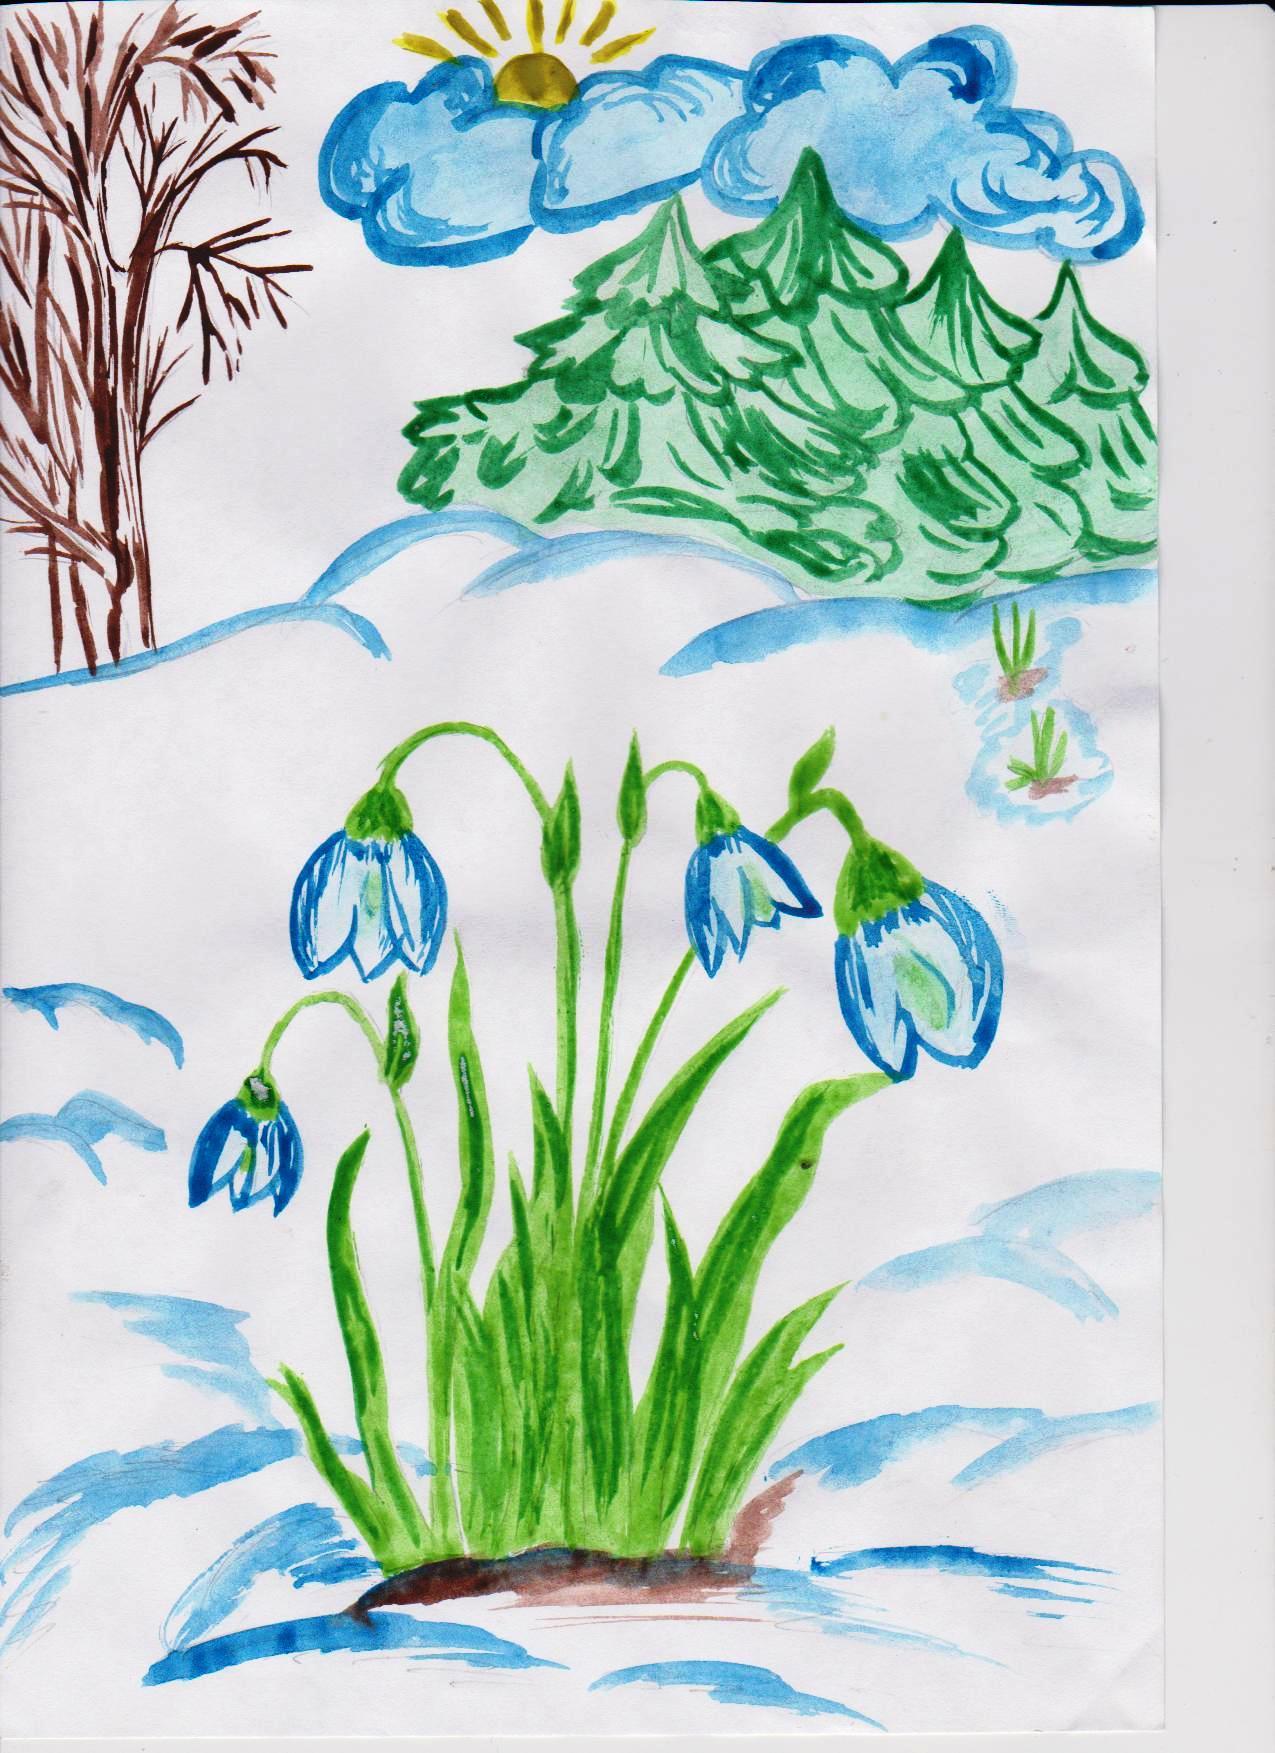 Весна карандашами для детей